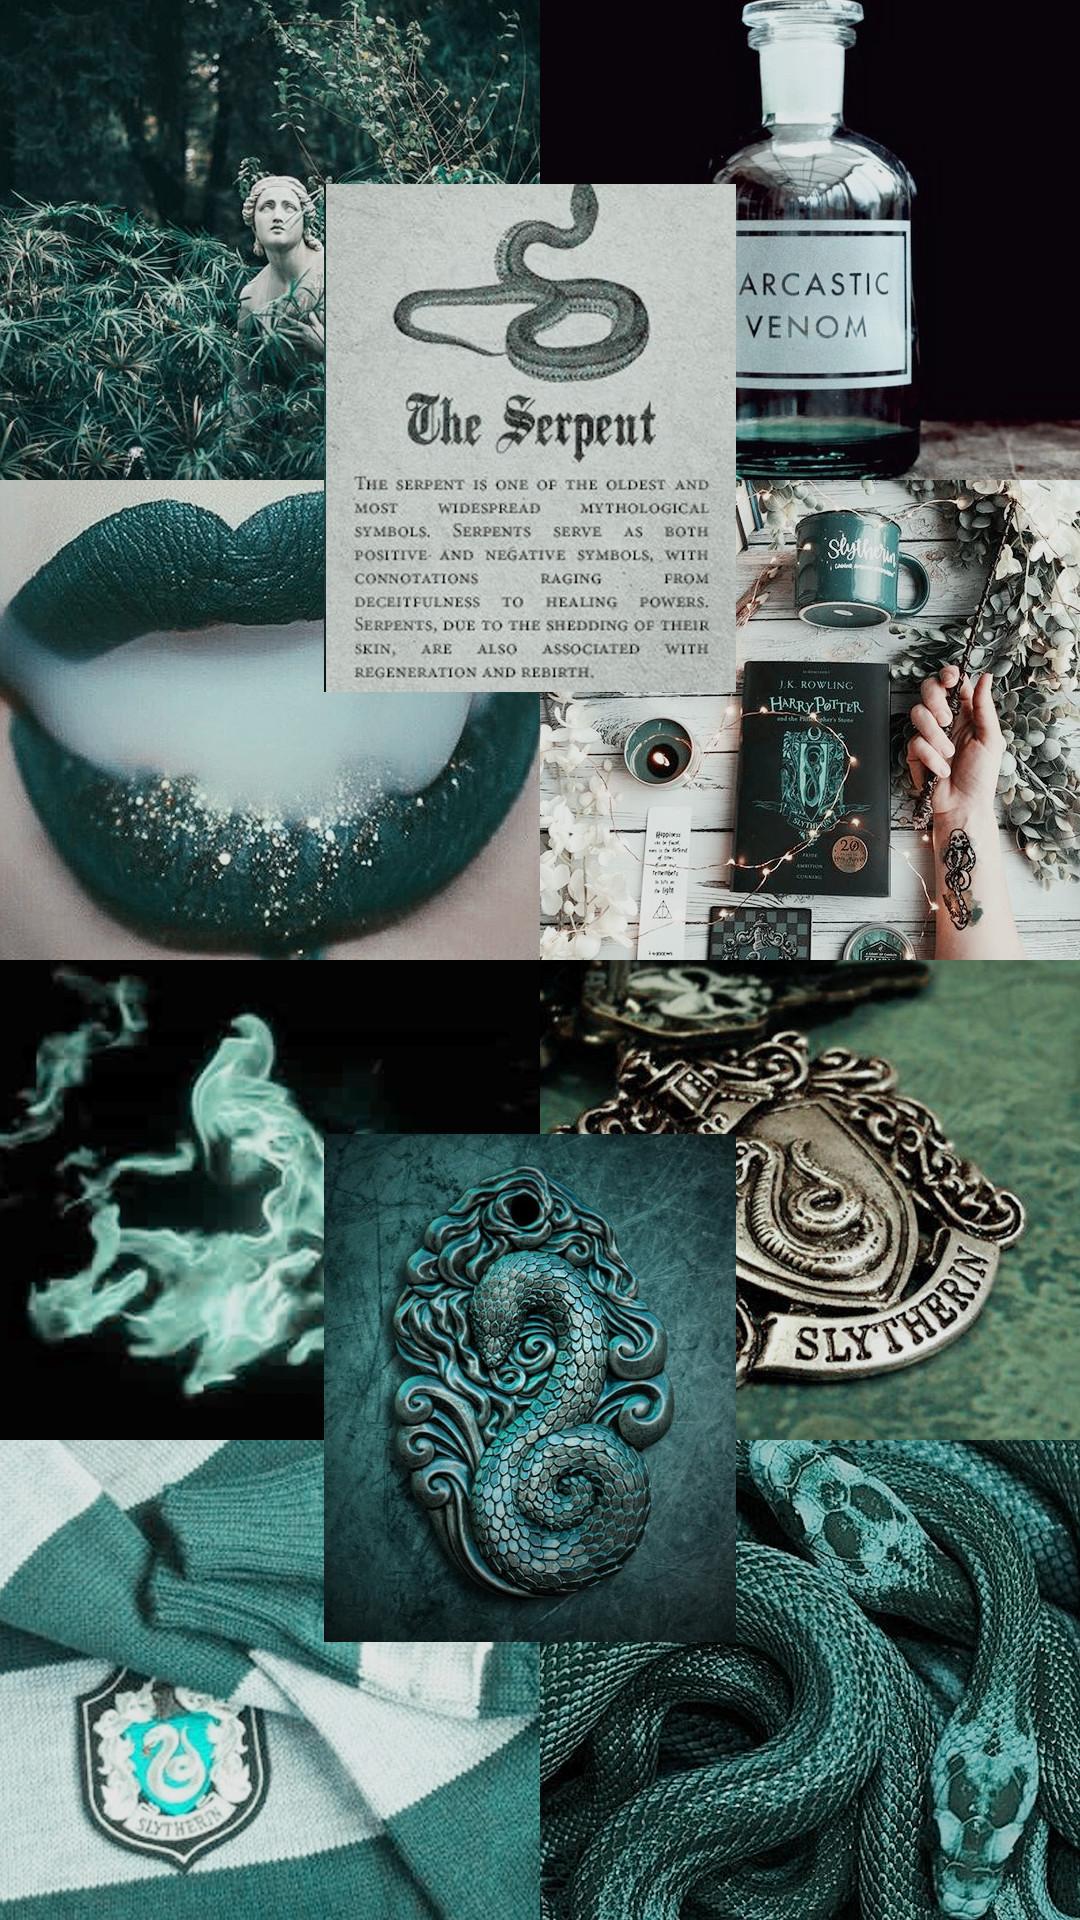 1080x1920, Harry Potter Locskcreens Harry Potter Lockscreens - Aesthetic Harry Potter Wallpaper For Iphone - HD Wallpaper